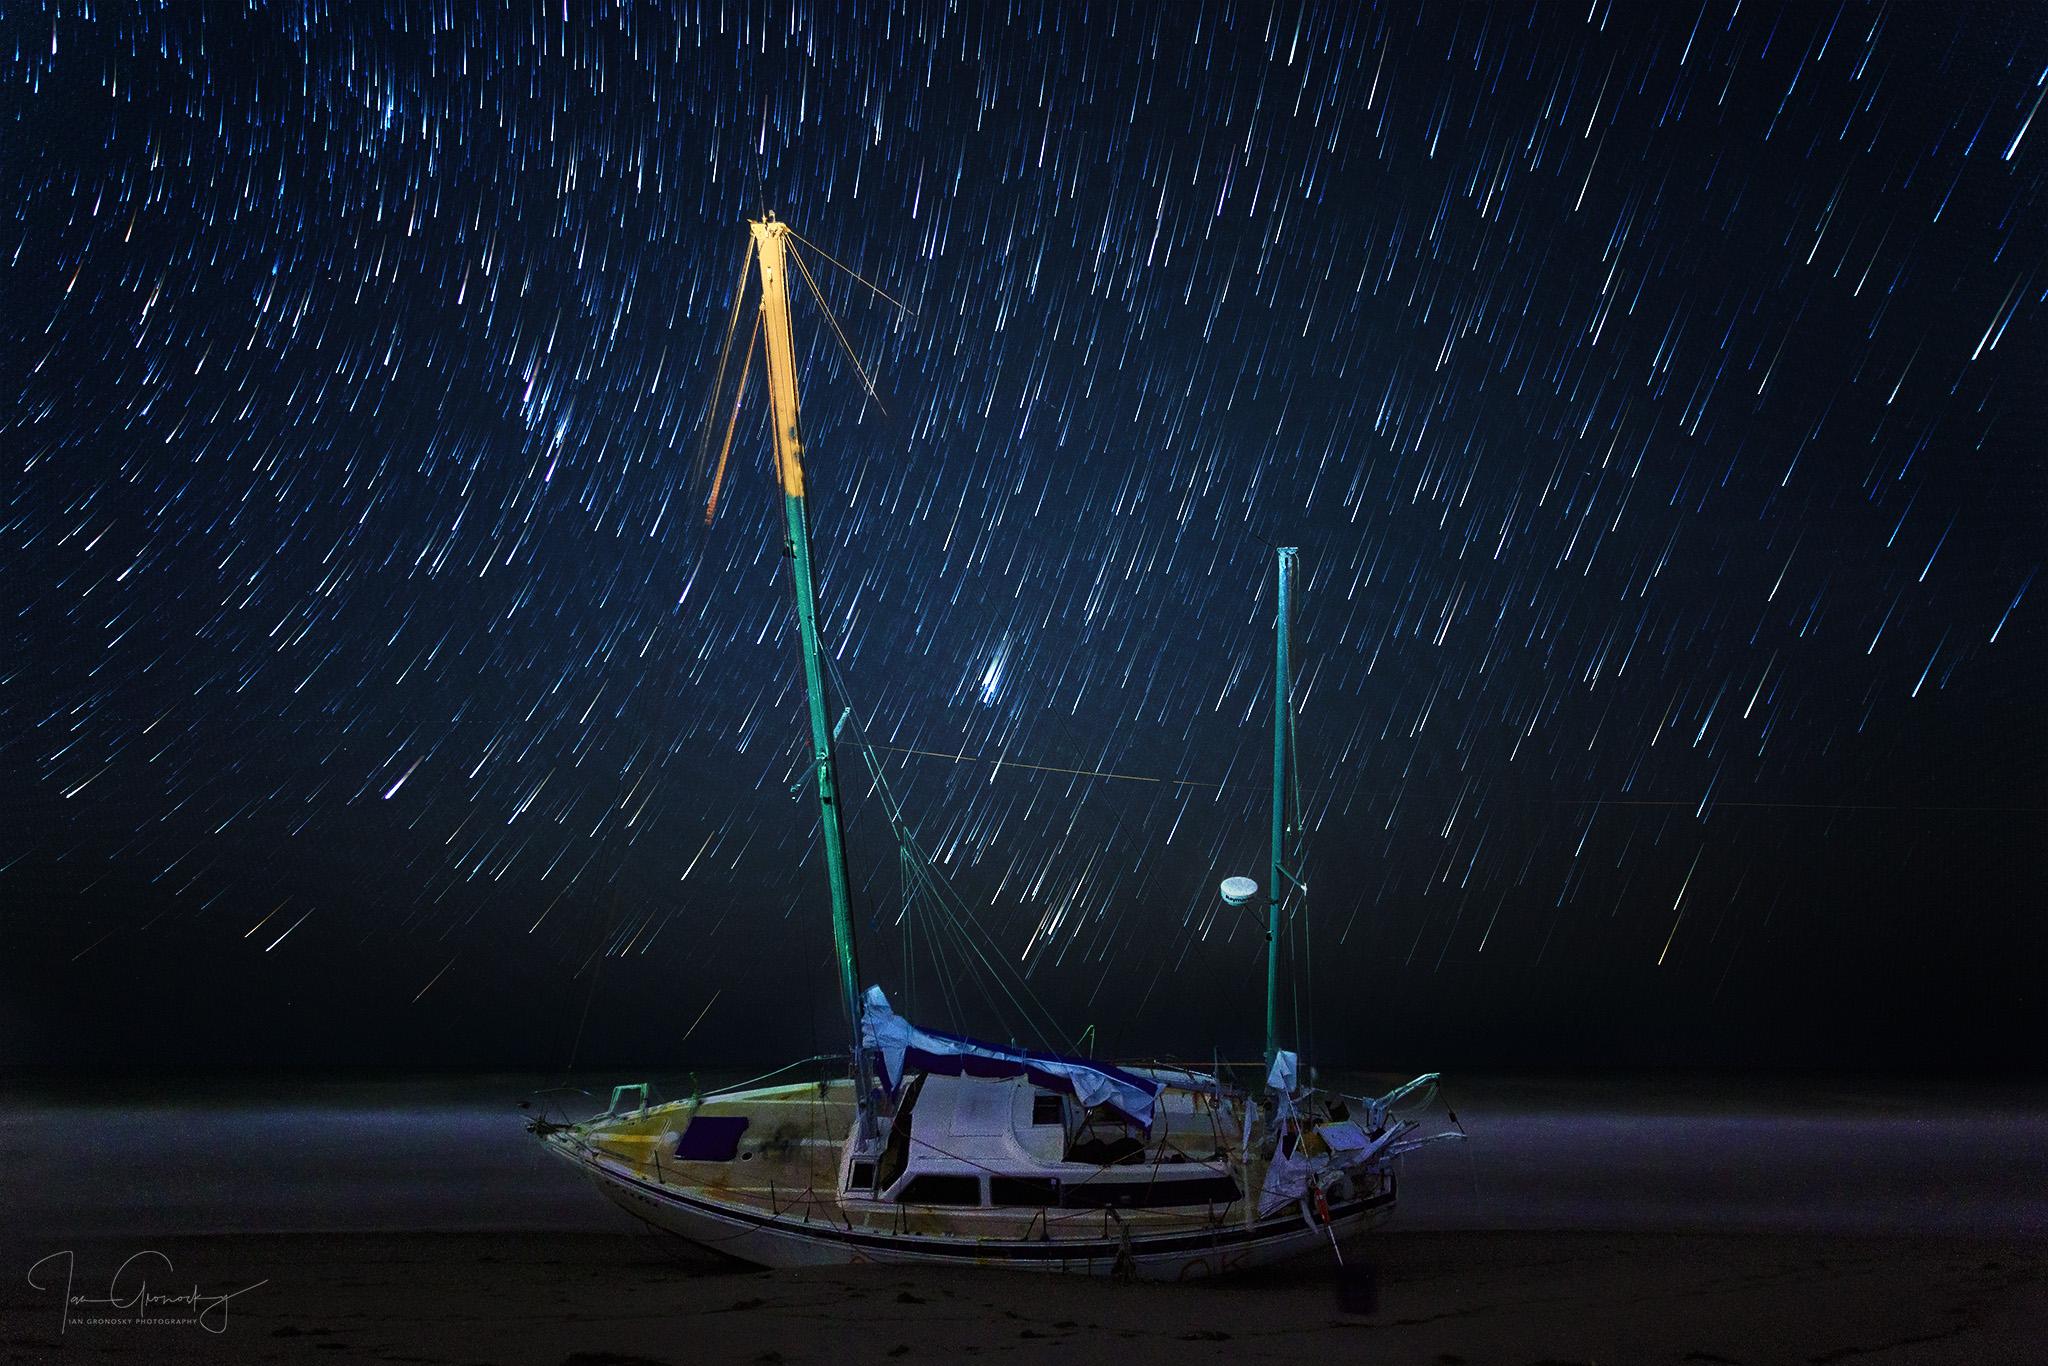 Trails Boat 1.jpg